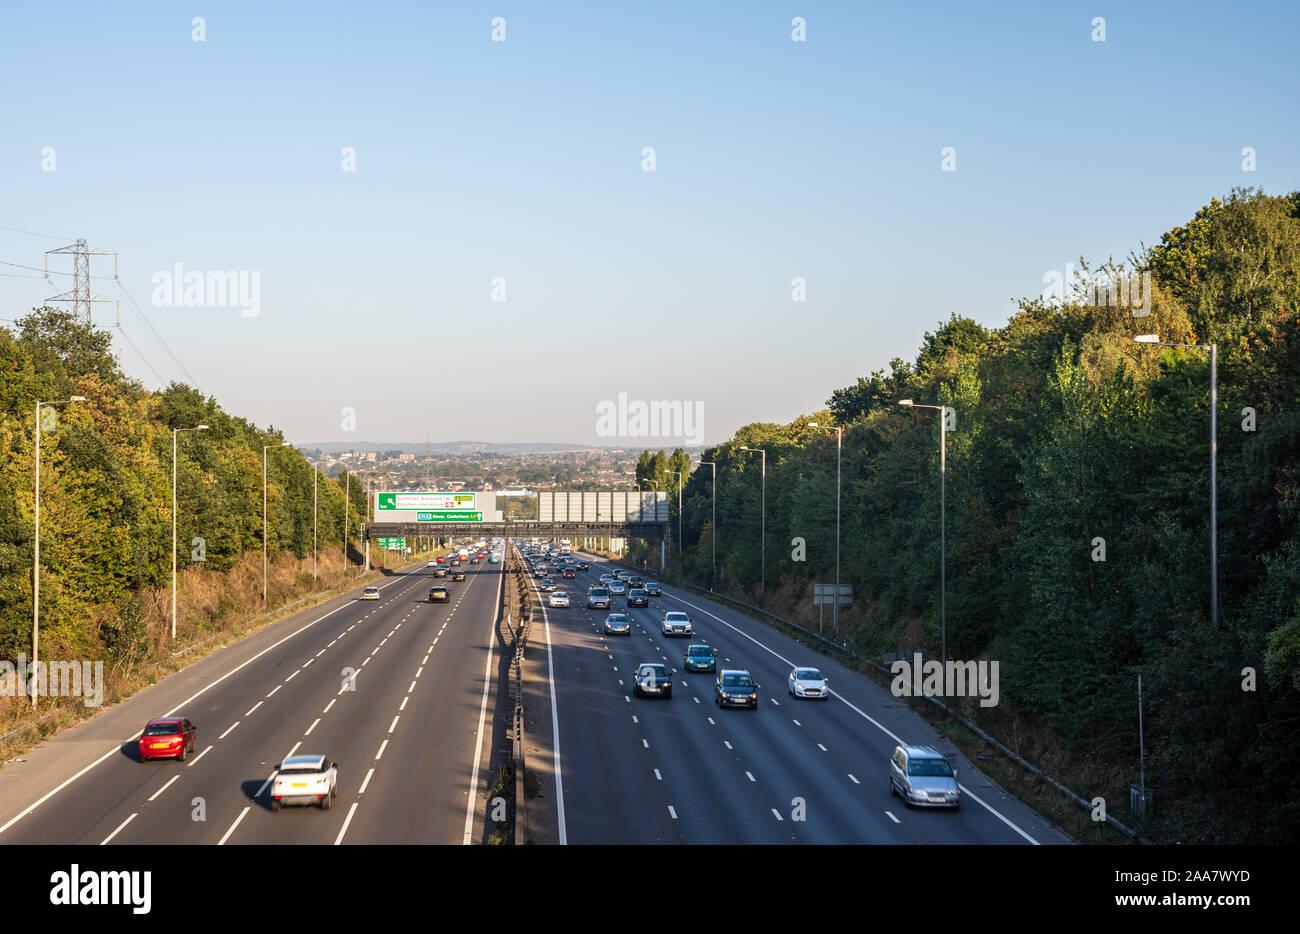 Dartford, England, UK - September 21, 2019: Traffic flows on the A2 motorway at Ebbsfleet between Dartford and Gravesend in north Kent. Stock Photo